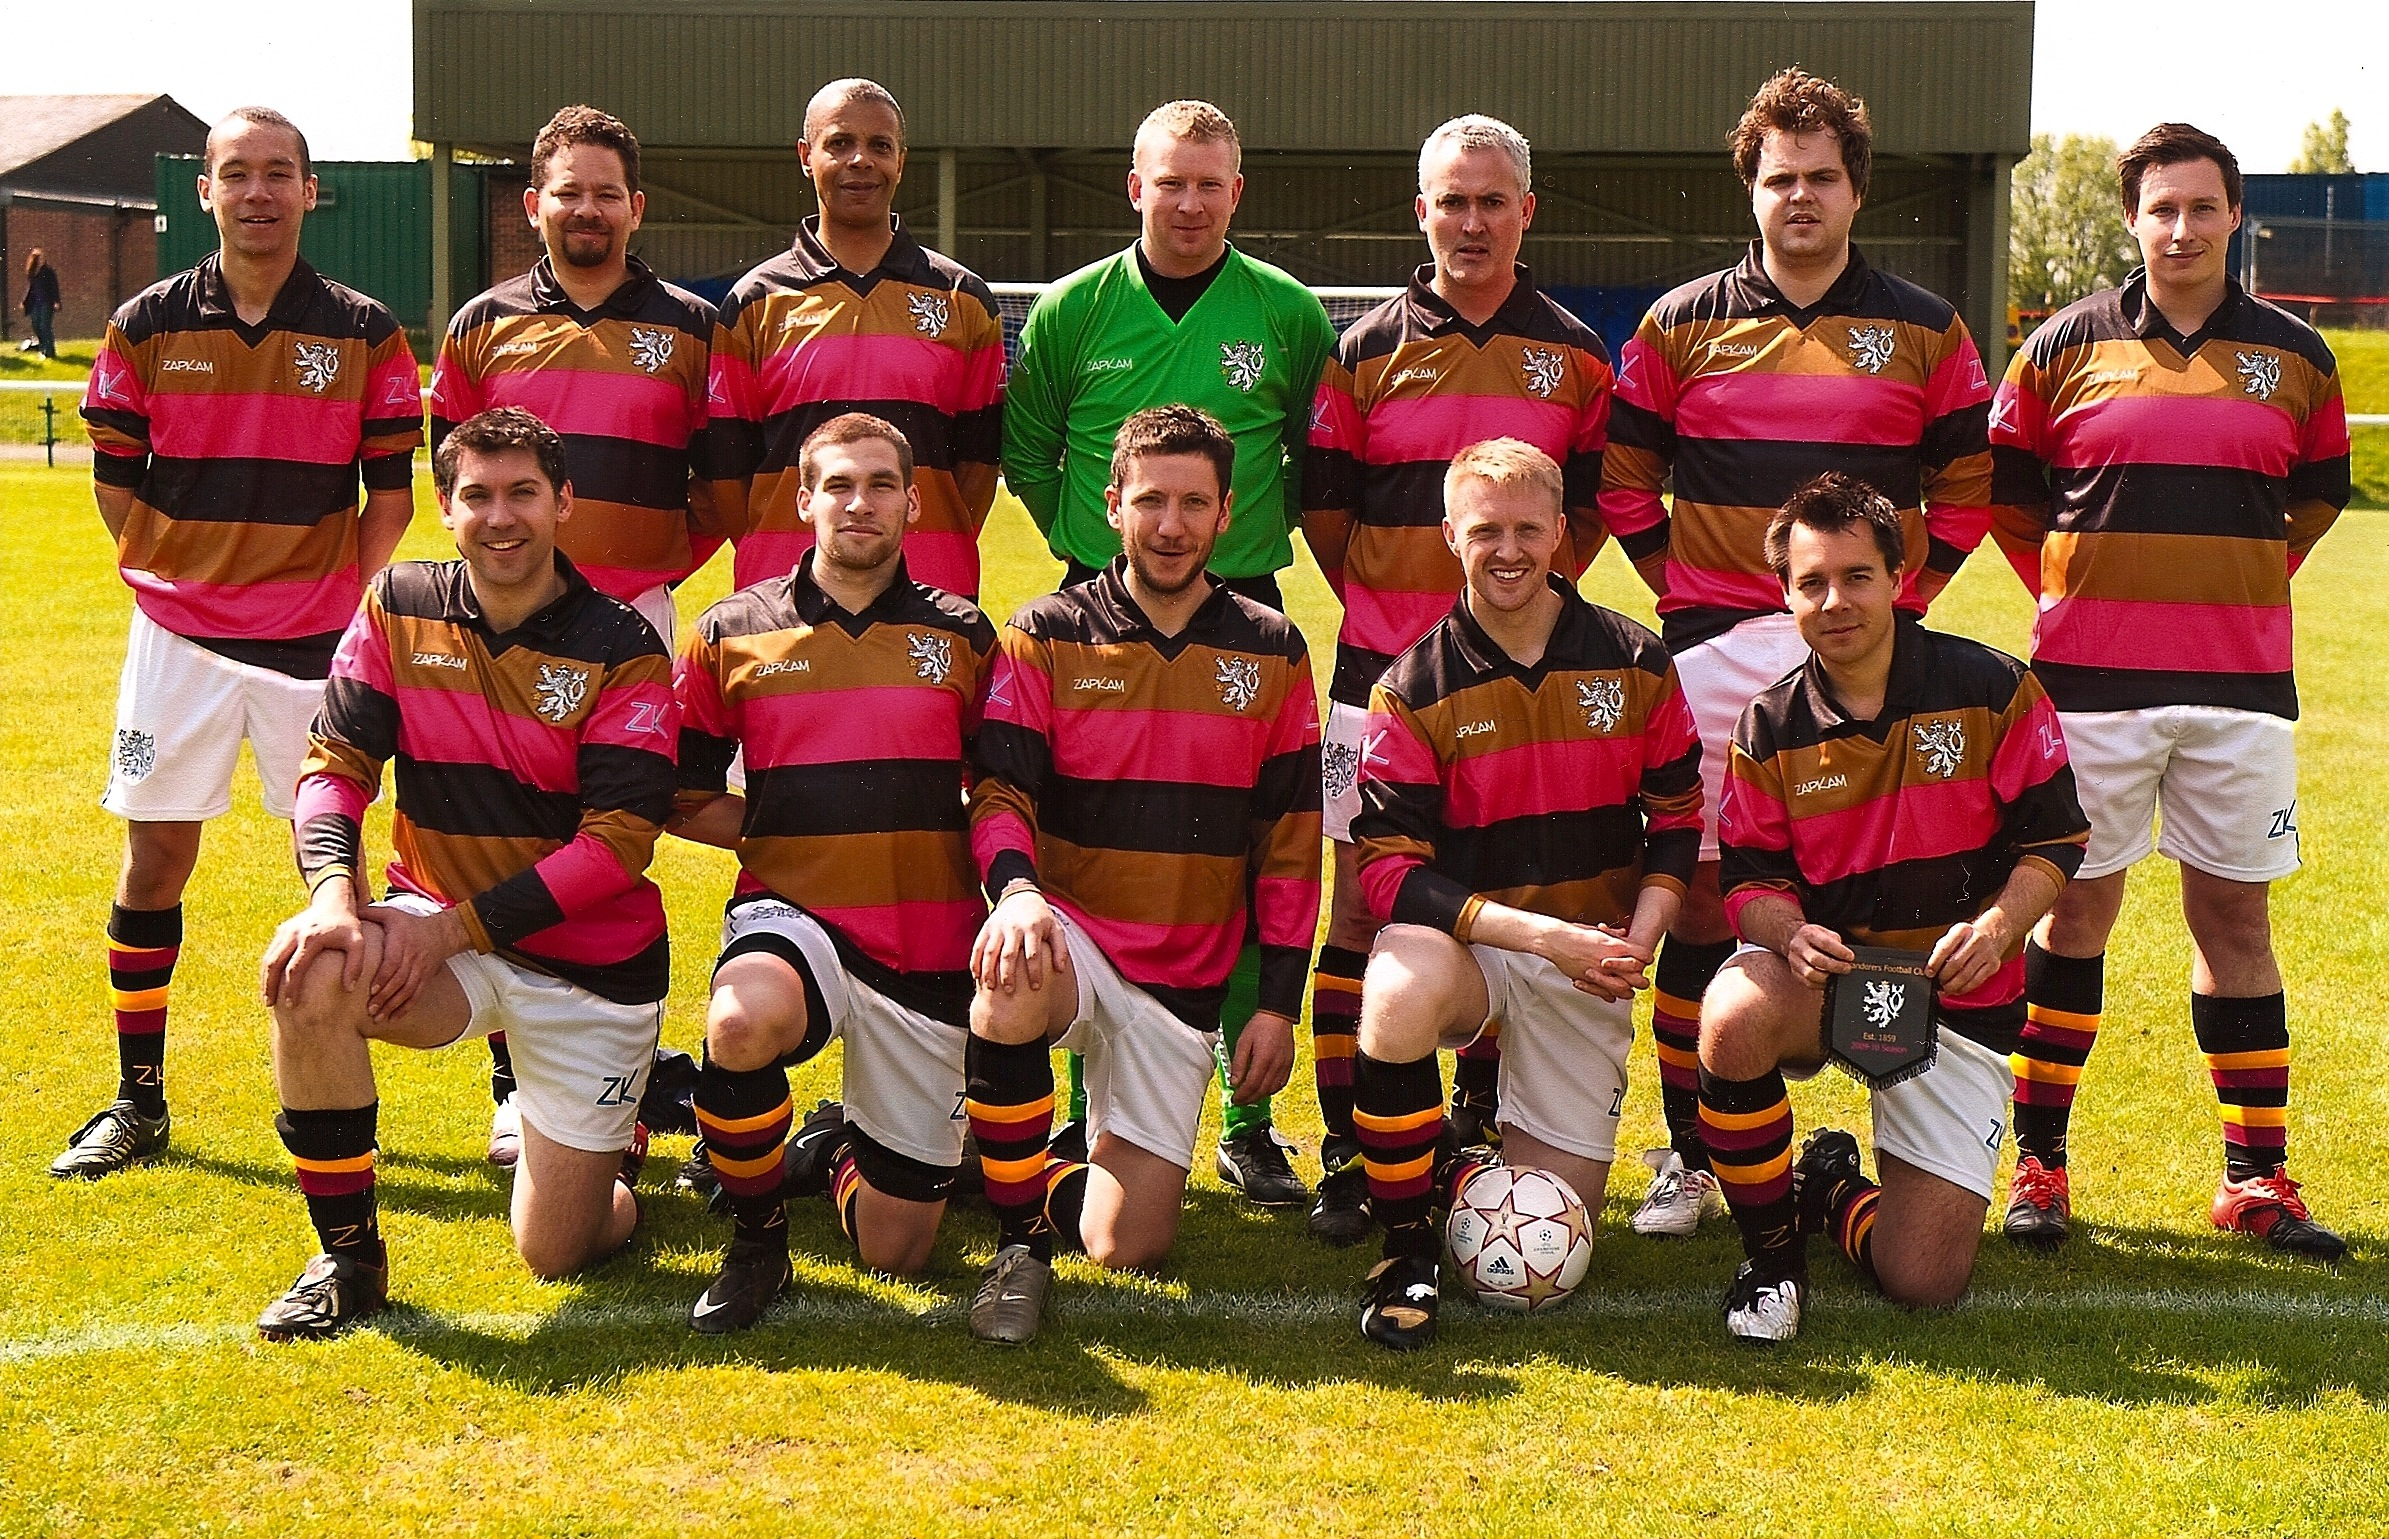 File:Modern Wanderers Team.jpg - Wikimedia Commons